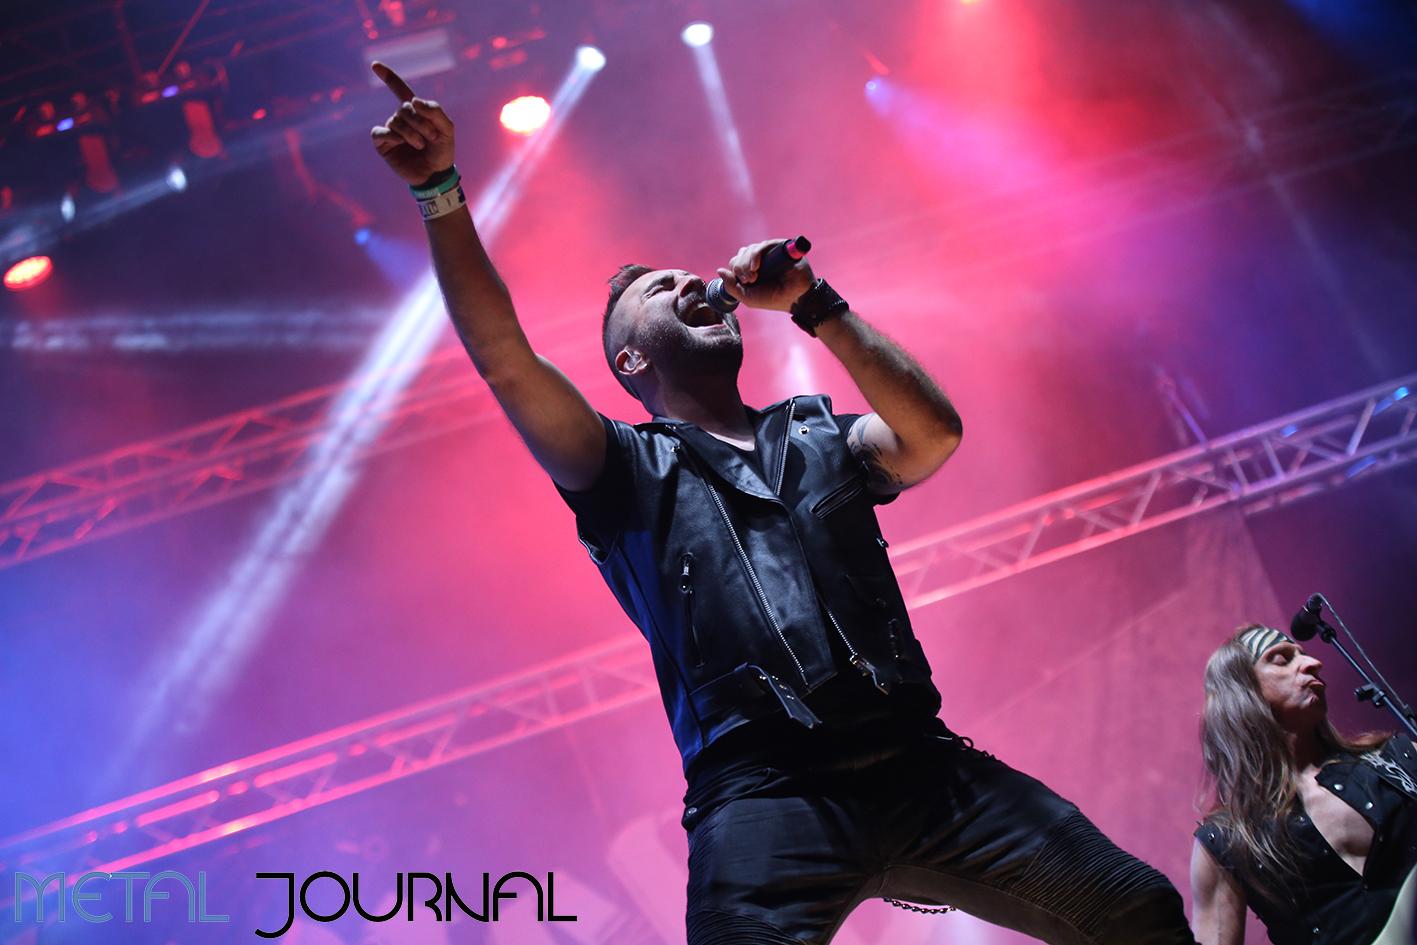 avalanch - leyendas del rock 2019 metal journal pic 1